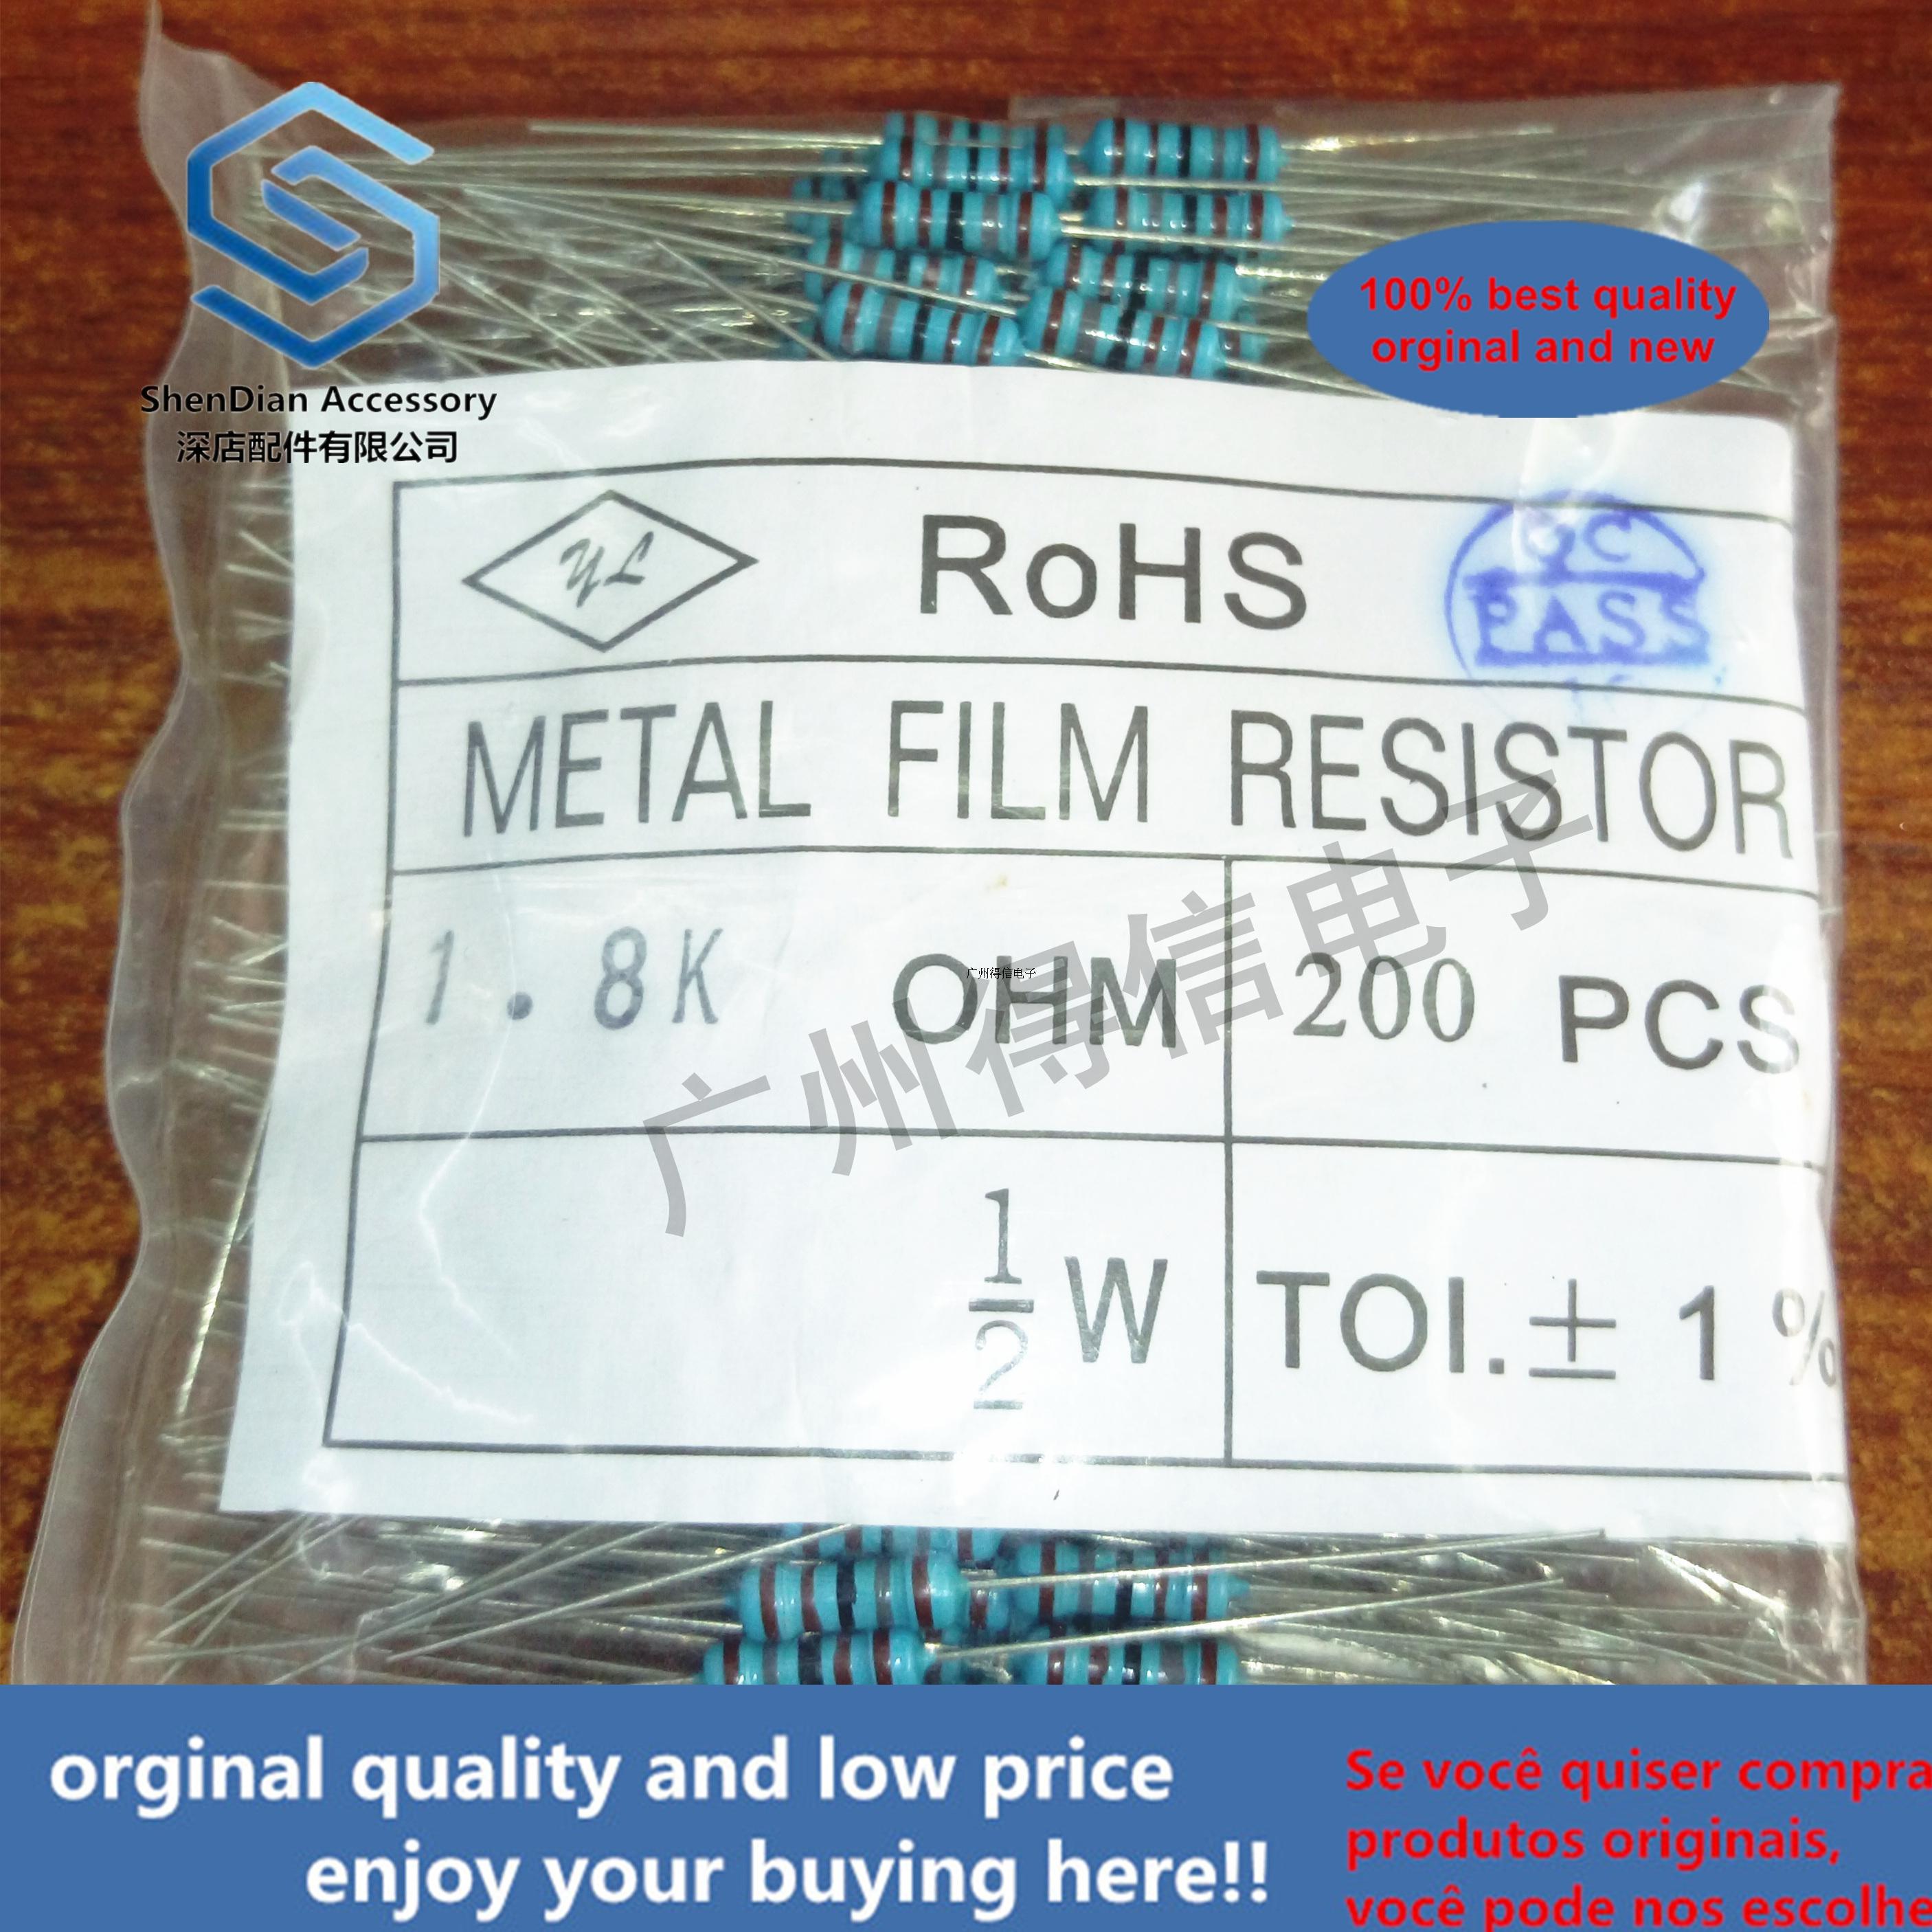 200pcs 1 / 2W 3.9K 3900 Euro 1% Brand New Metal Film Iron Feet Resistor Bag 200 Pcs Per Pack